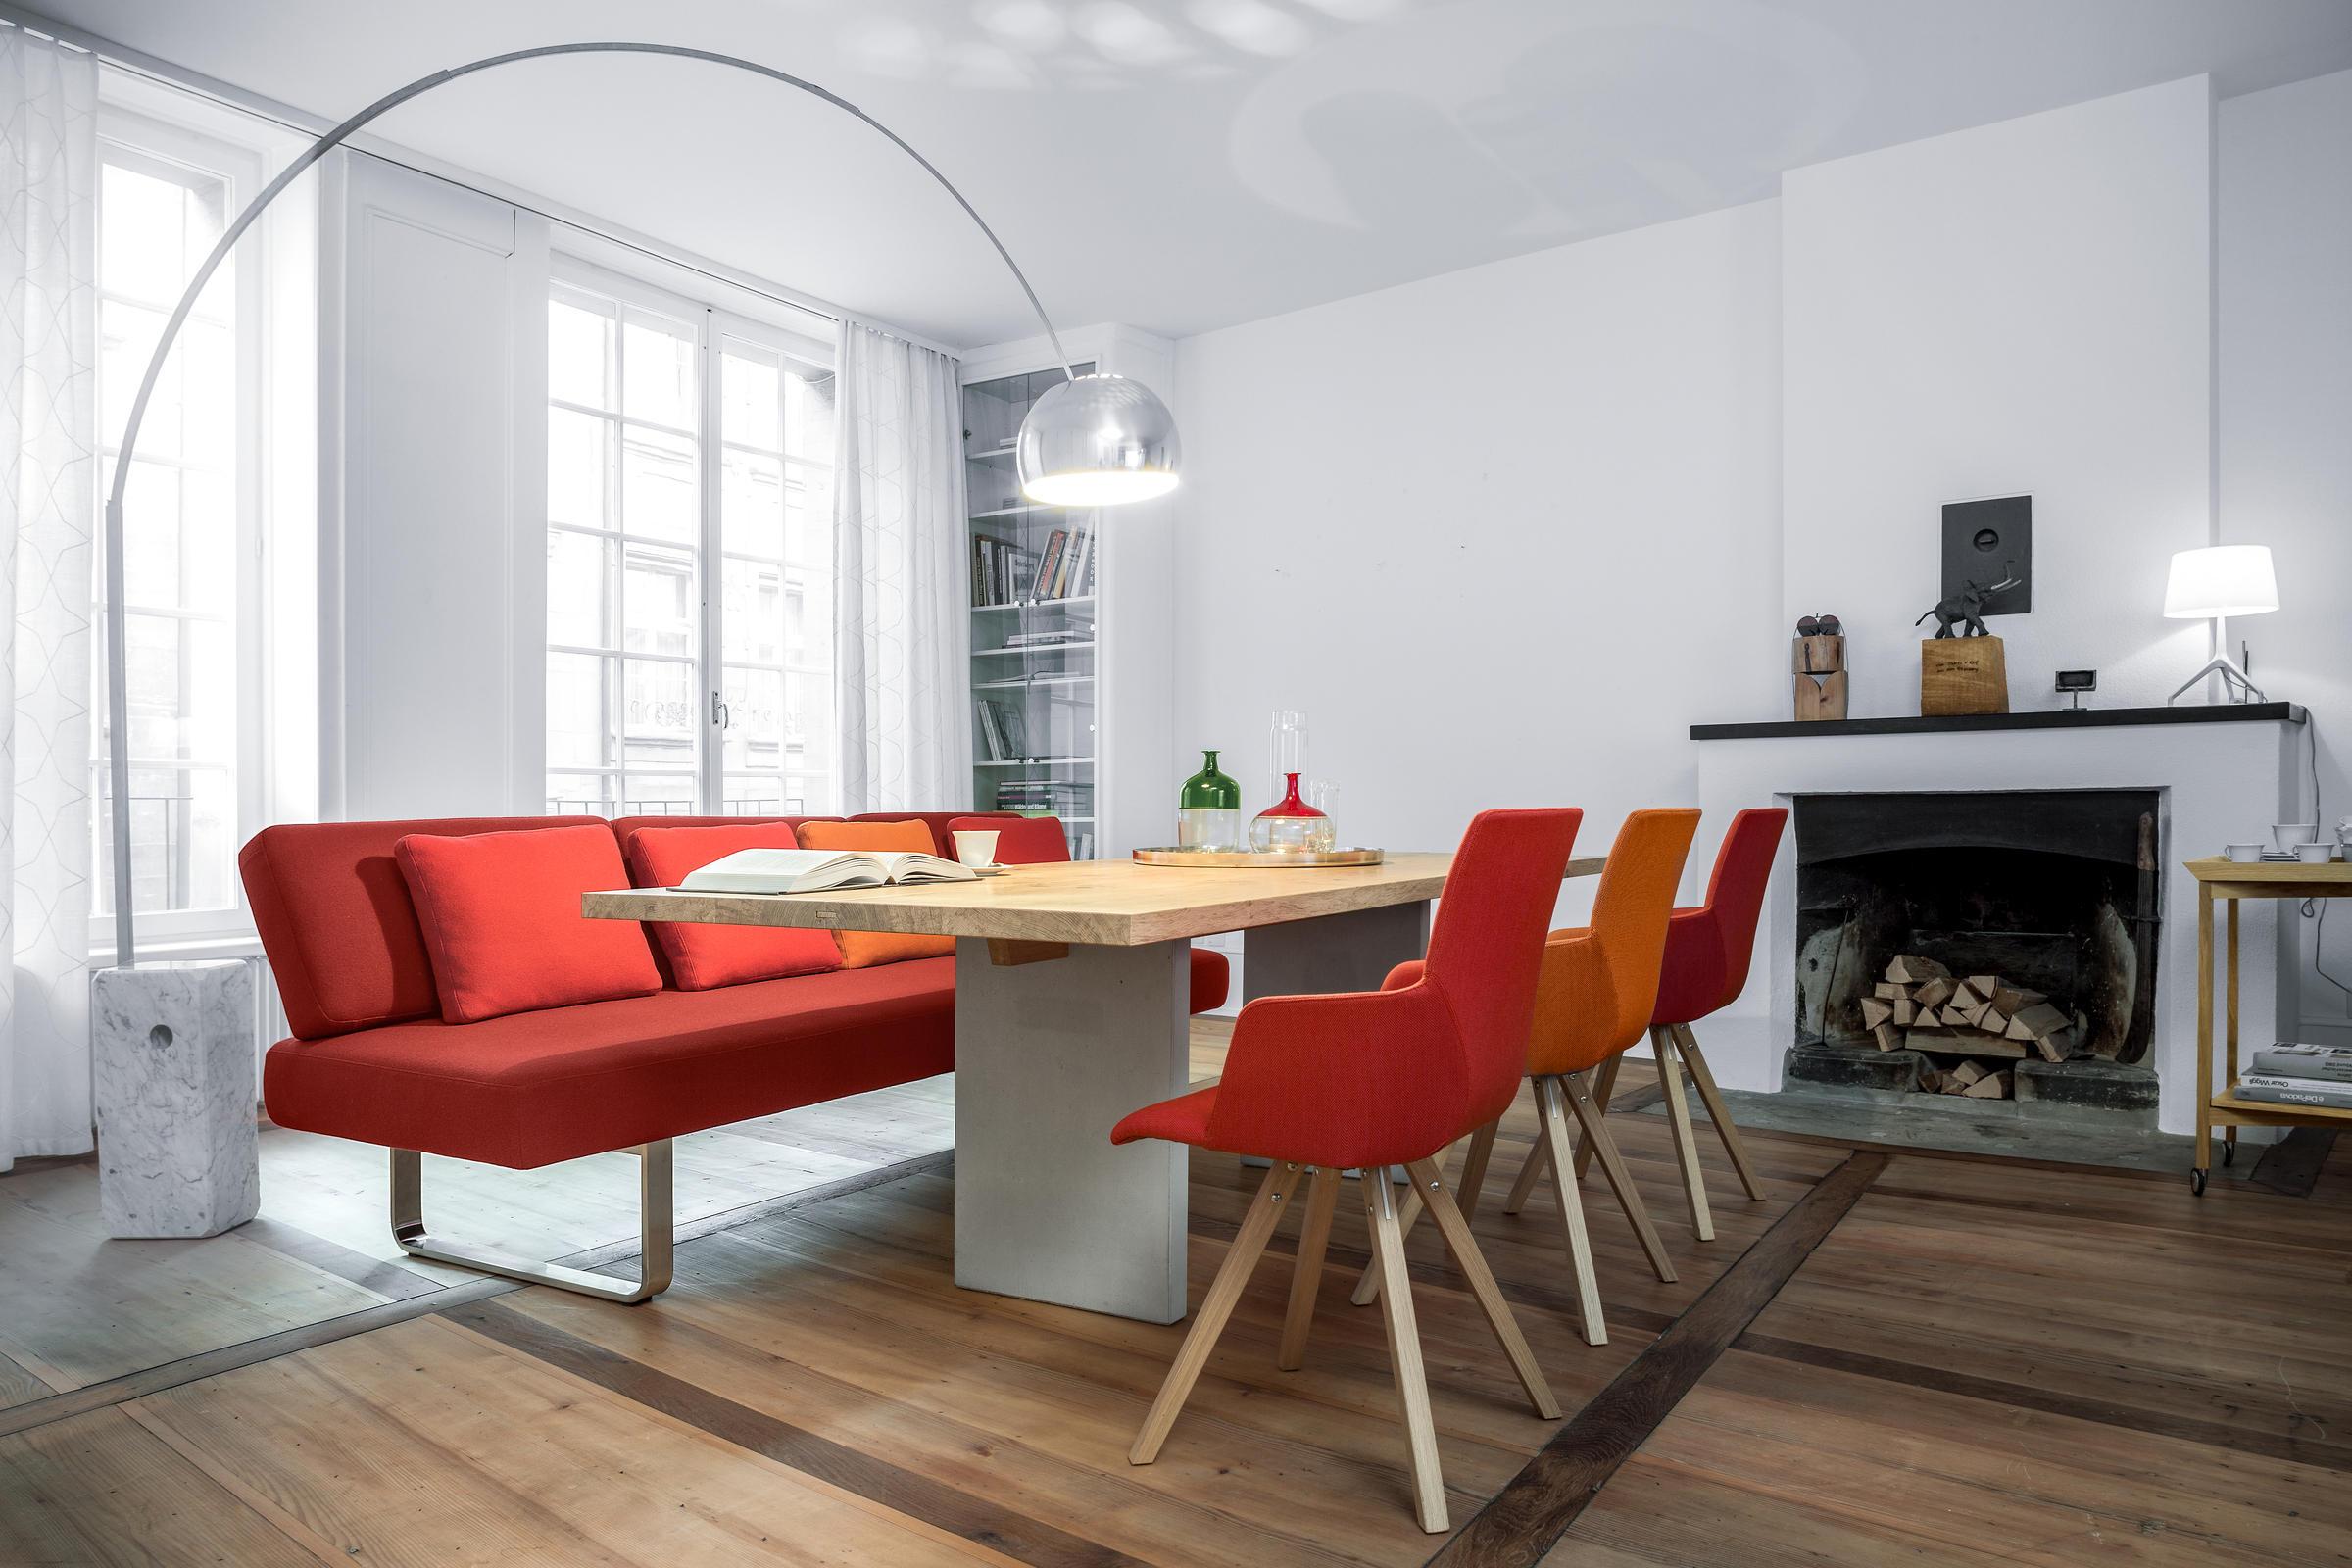 JOLINE - Lounge sofas from Girsberger | Architonic